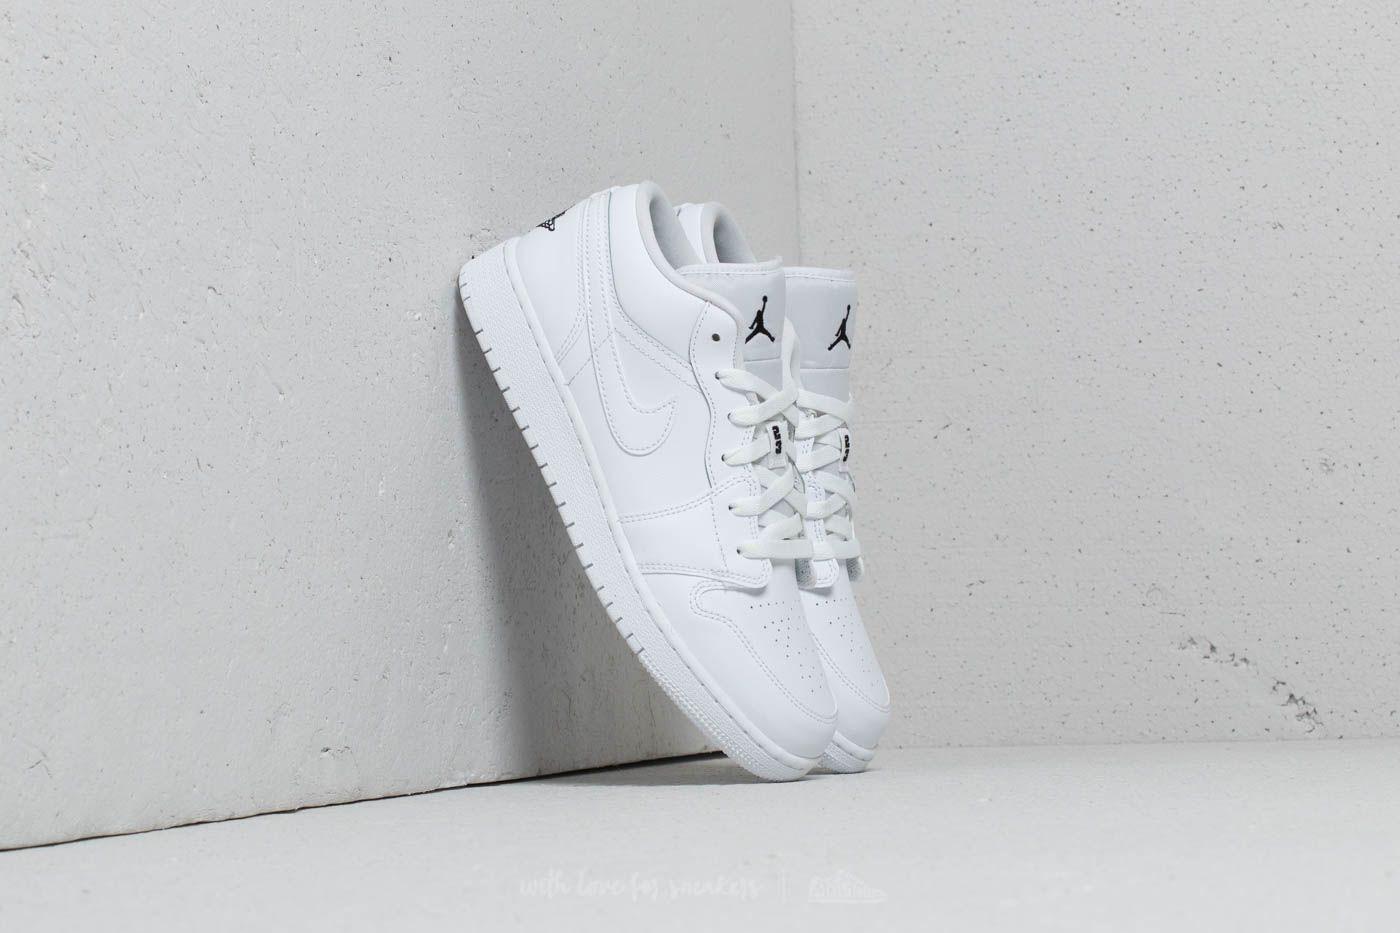 ce0bb0f97 Air Jordan 1 Low (GS) White  Black-White at a great price